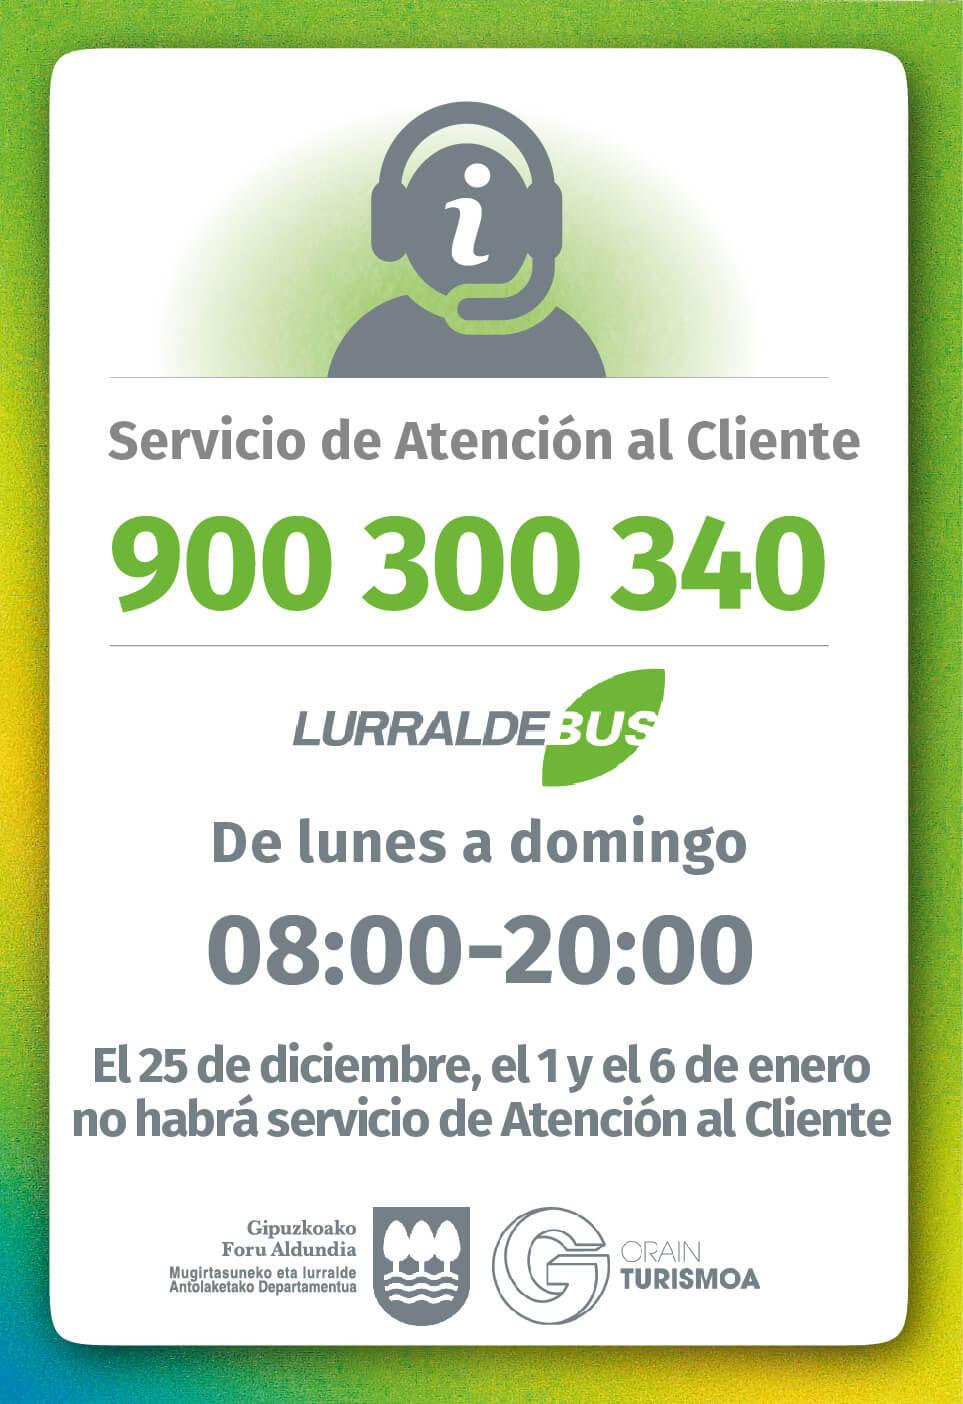 SAC 900 300 340